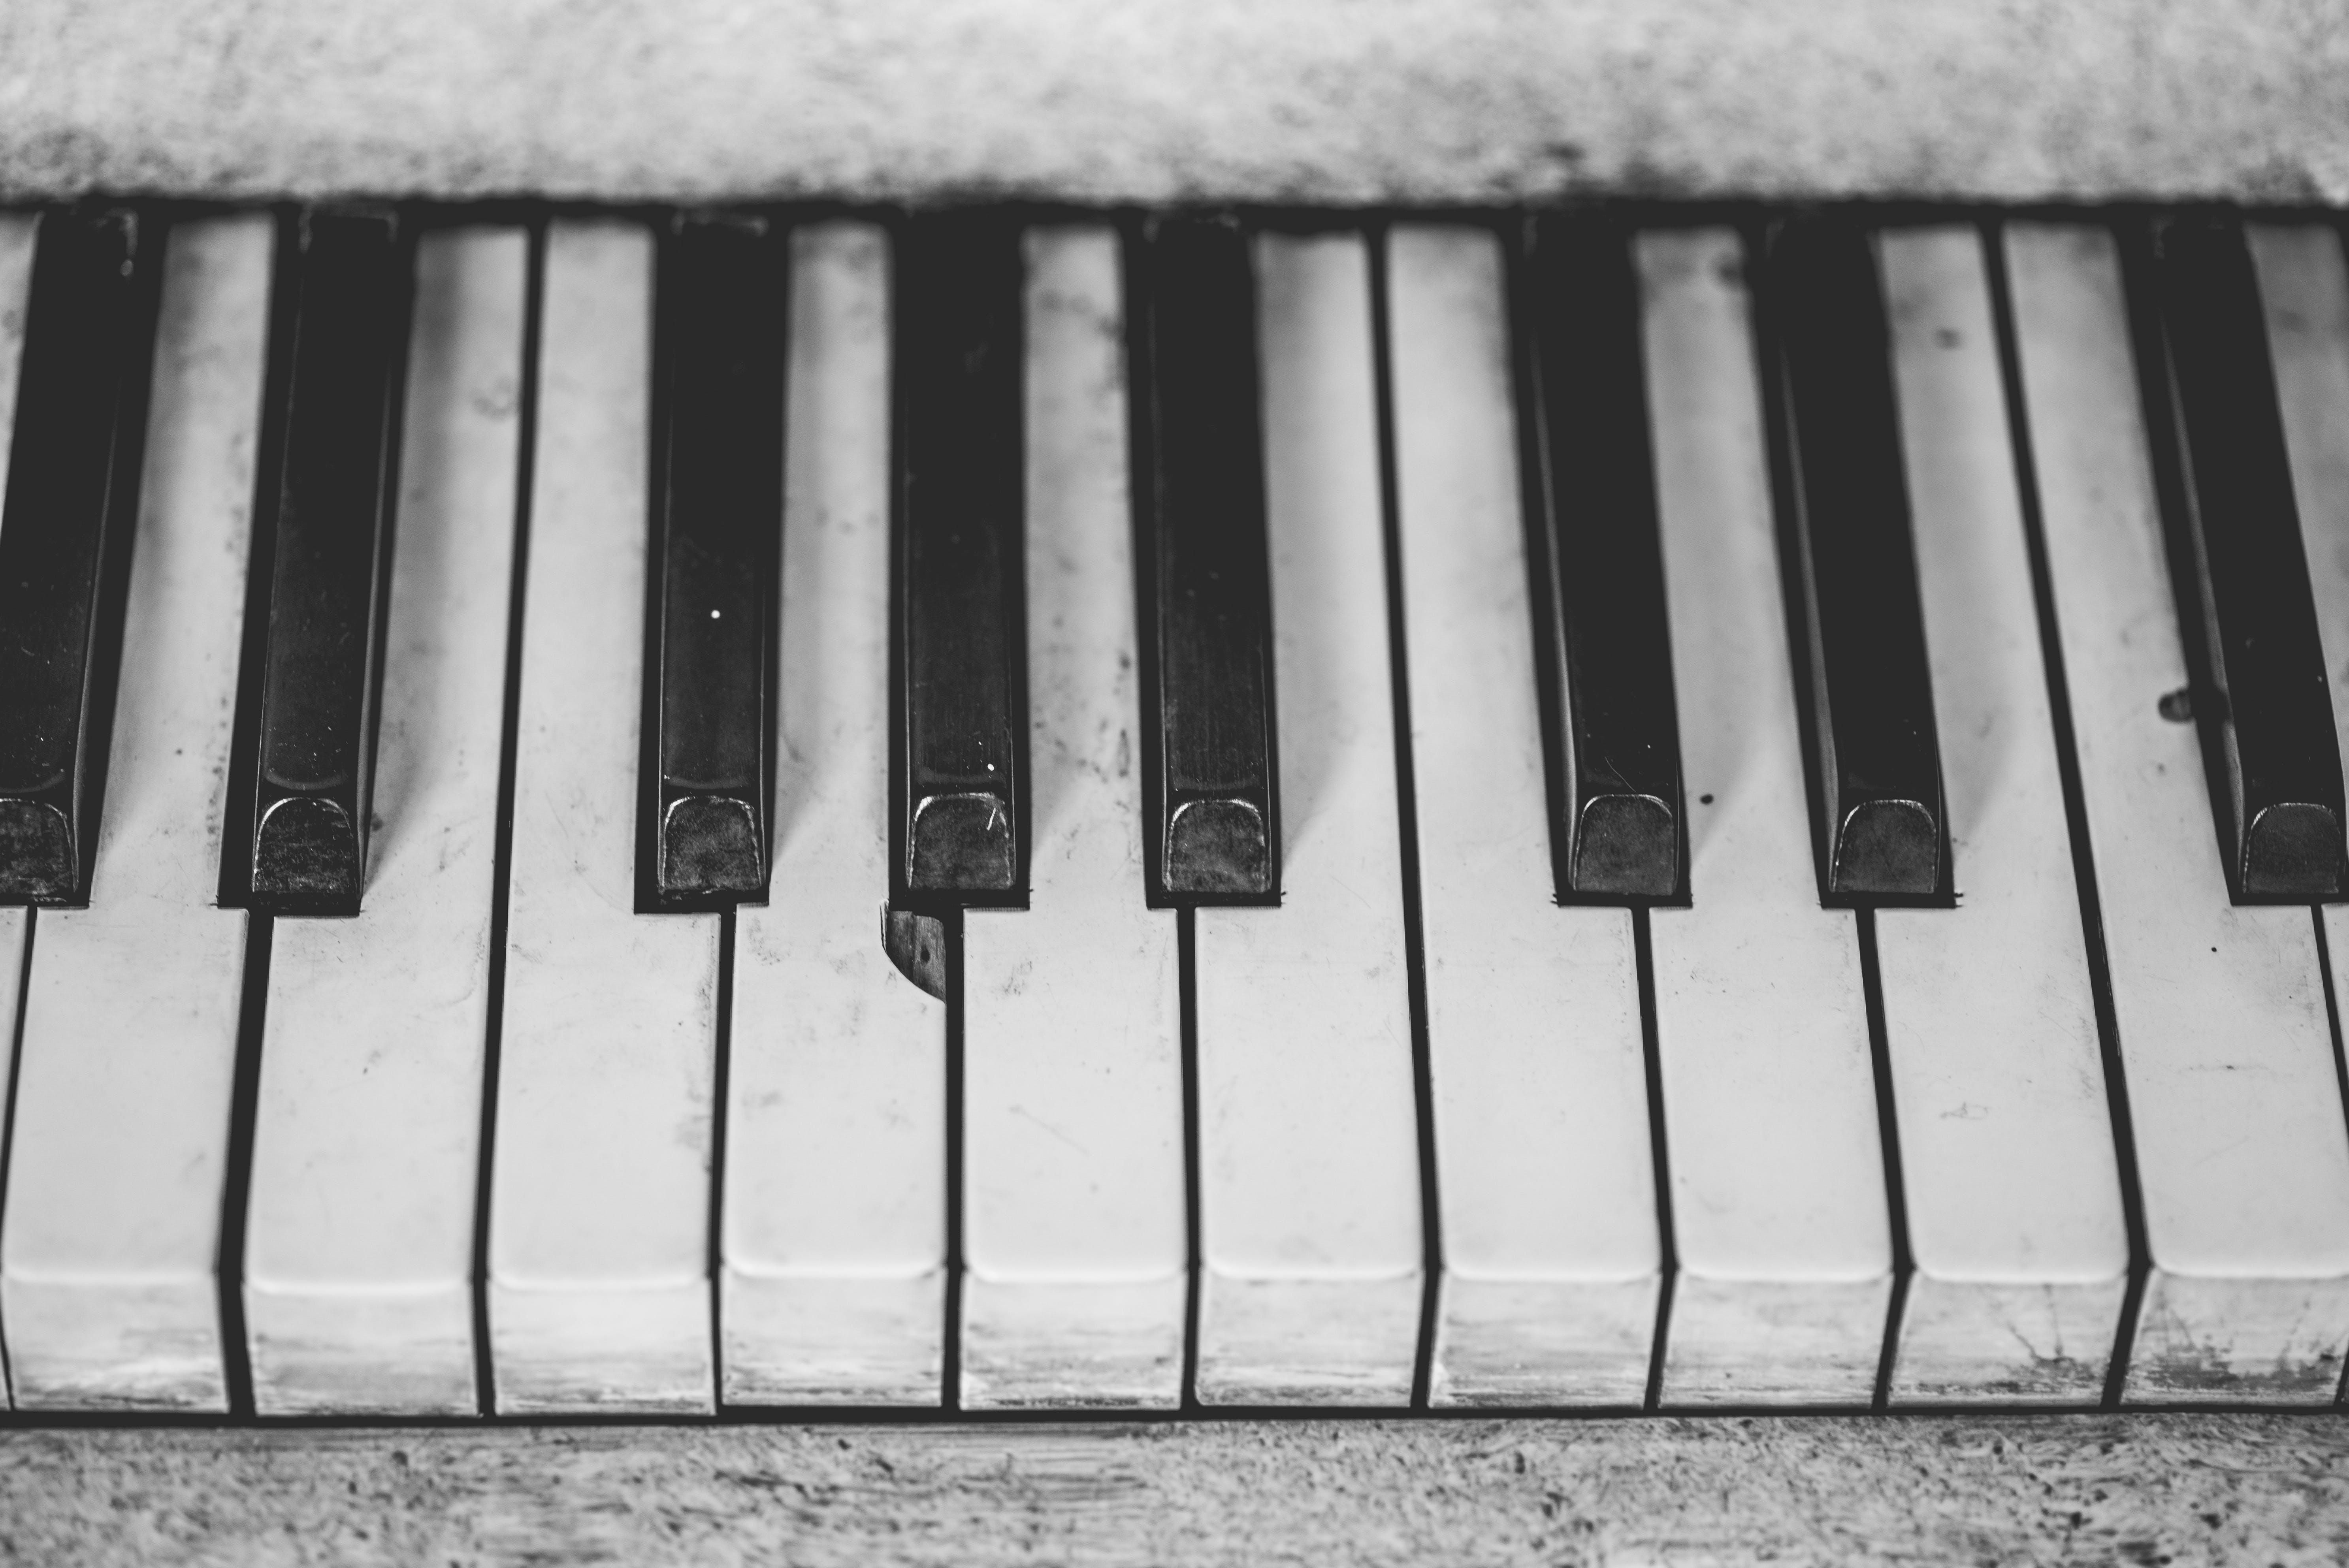 White Piano Keyboard